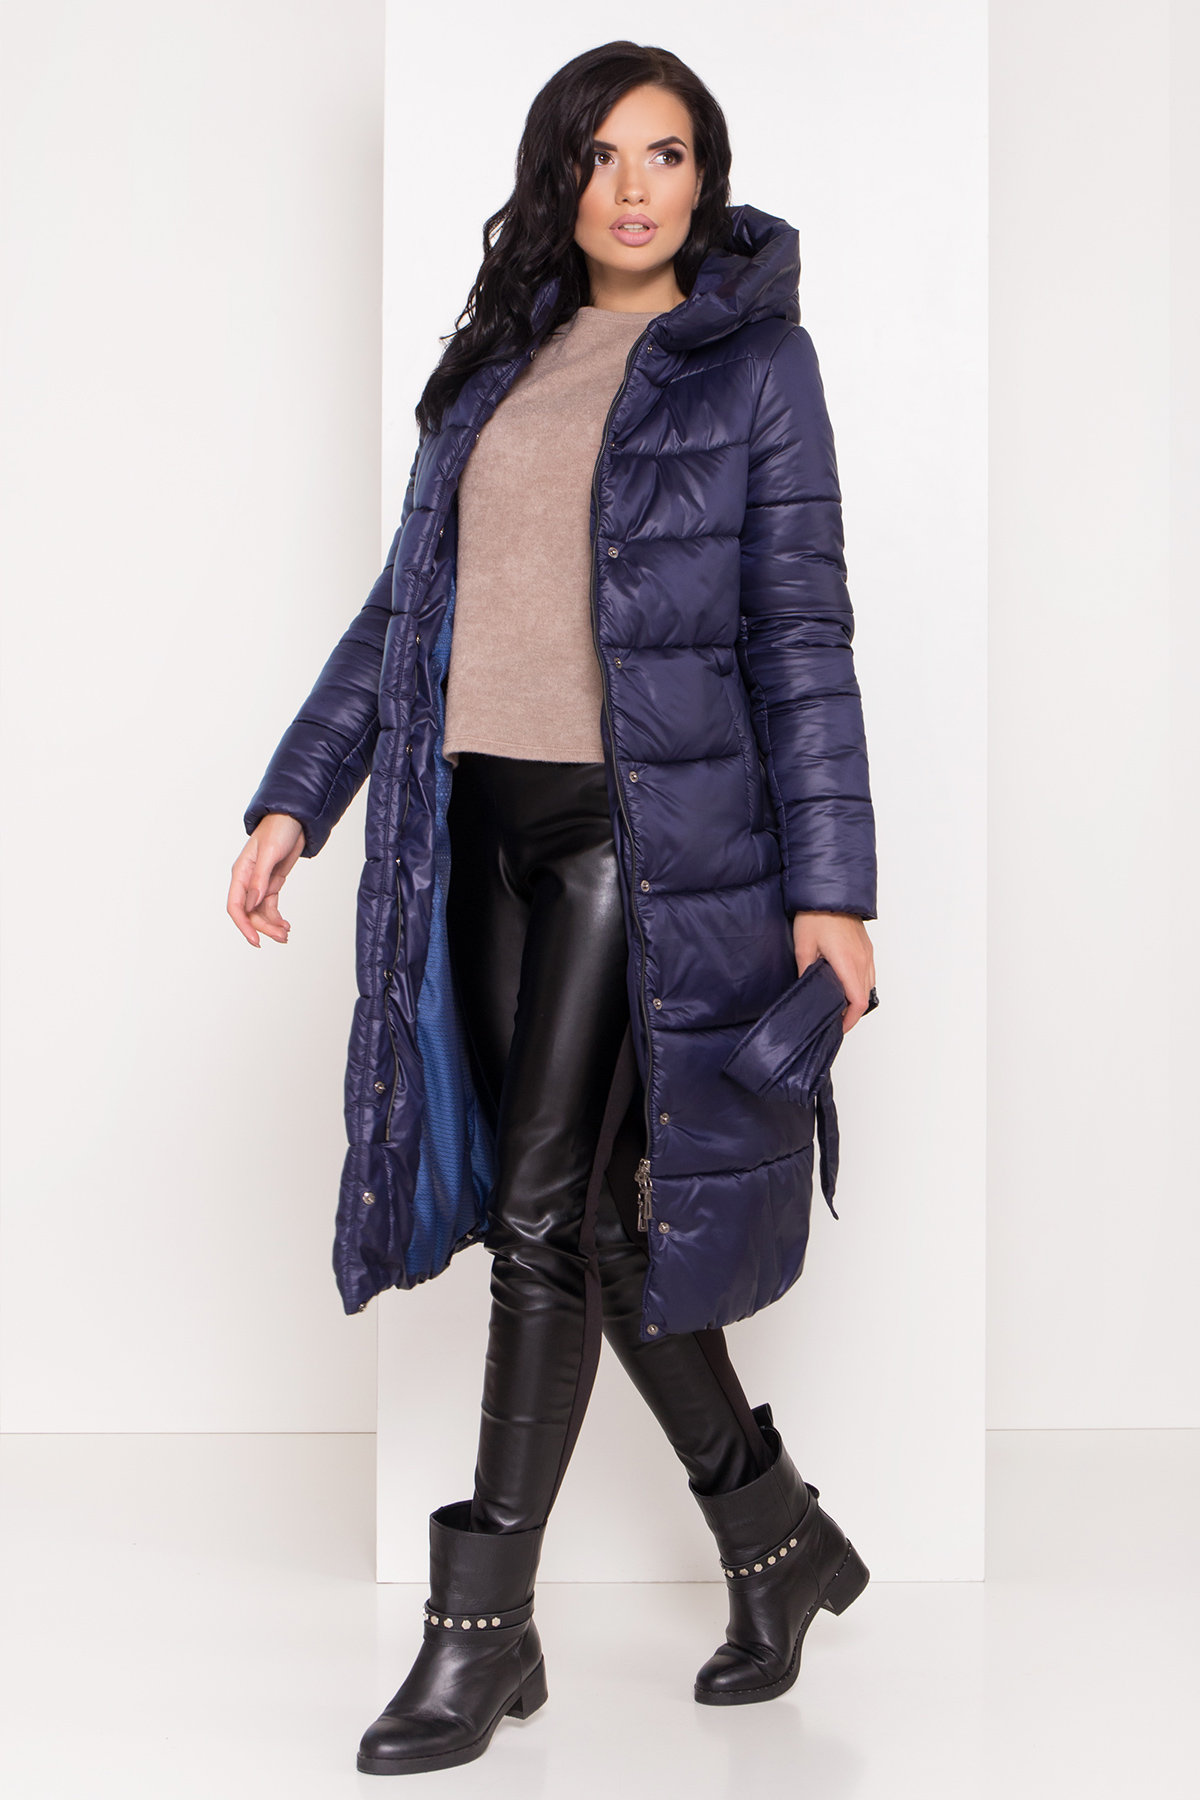 Длинная зимняя куртка-пуховик Сигма 8040 АРТ. 43989 Цвет: Т.синий - фото 6, интернет магазин tm-modus.ru